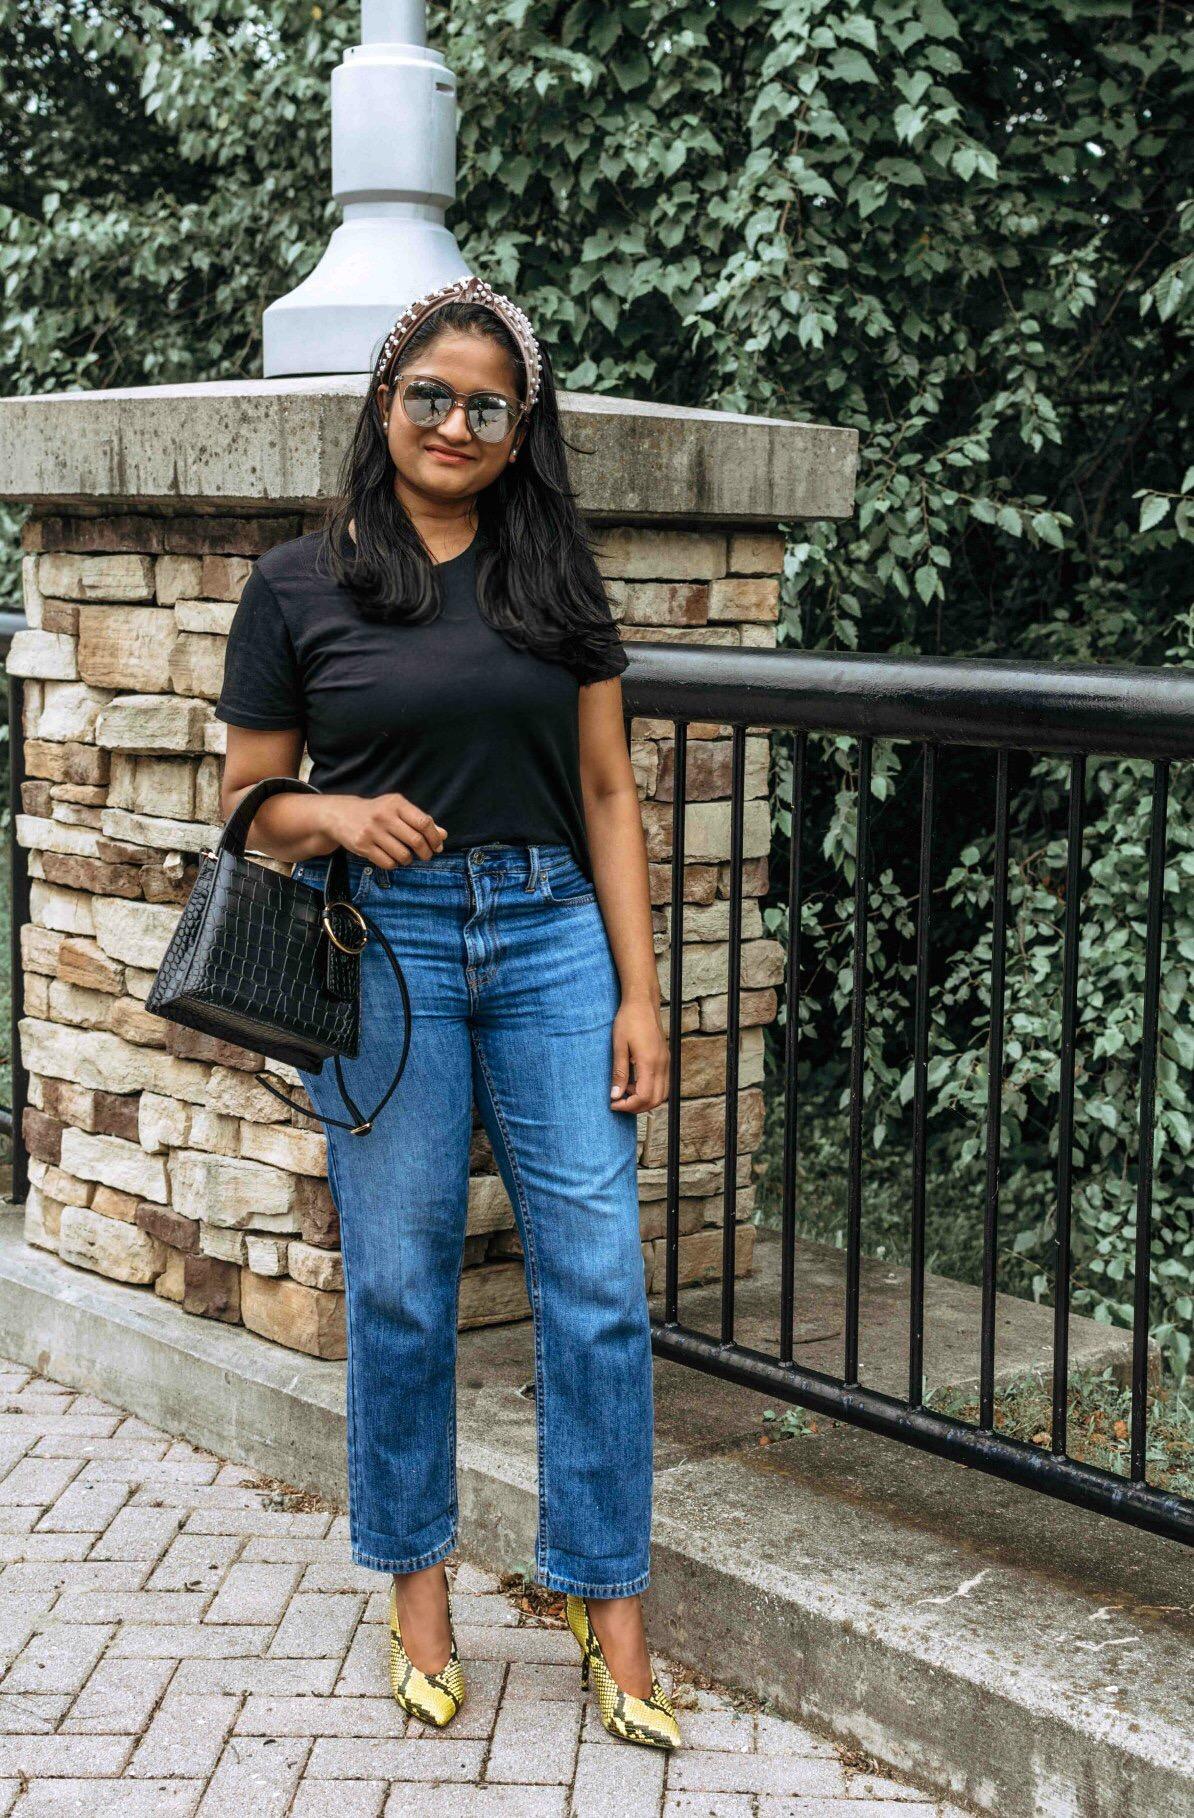 Wearing Everlane summer jeans, Cotton Box-Cut Tee, Pearl headband, Parisa Wang Enchanted Top Handle Bag 2